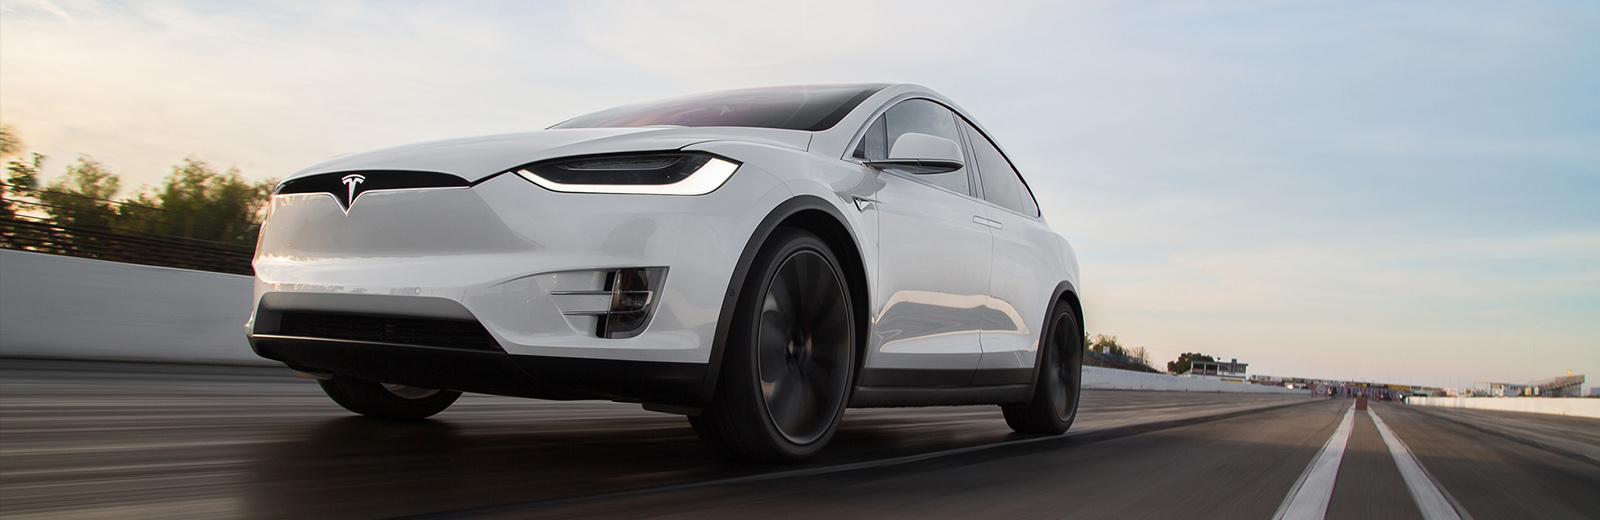 Range electic cars